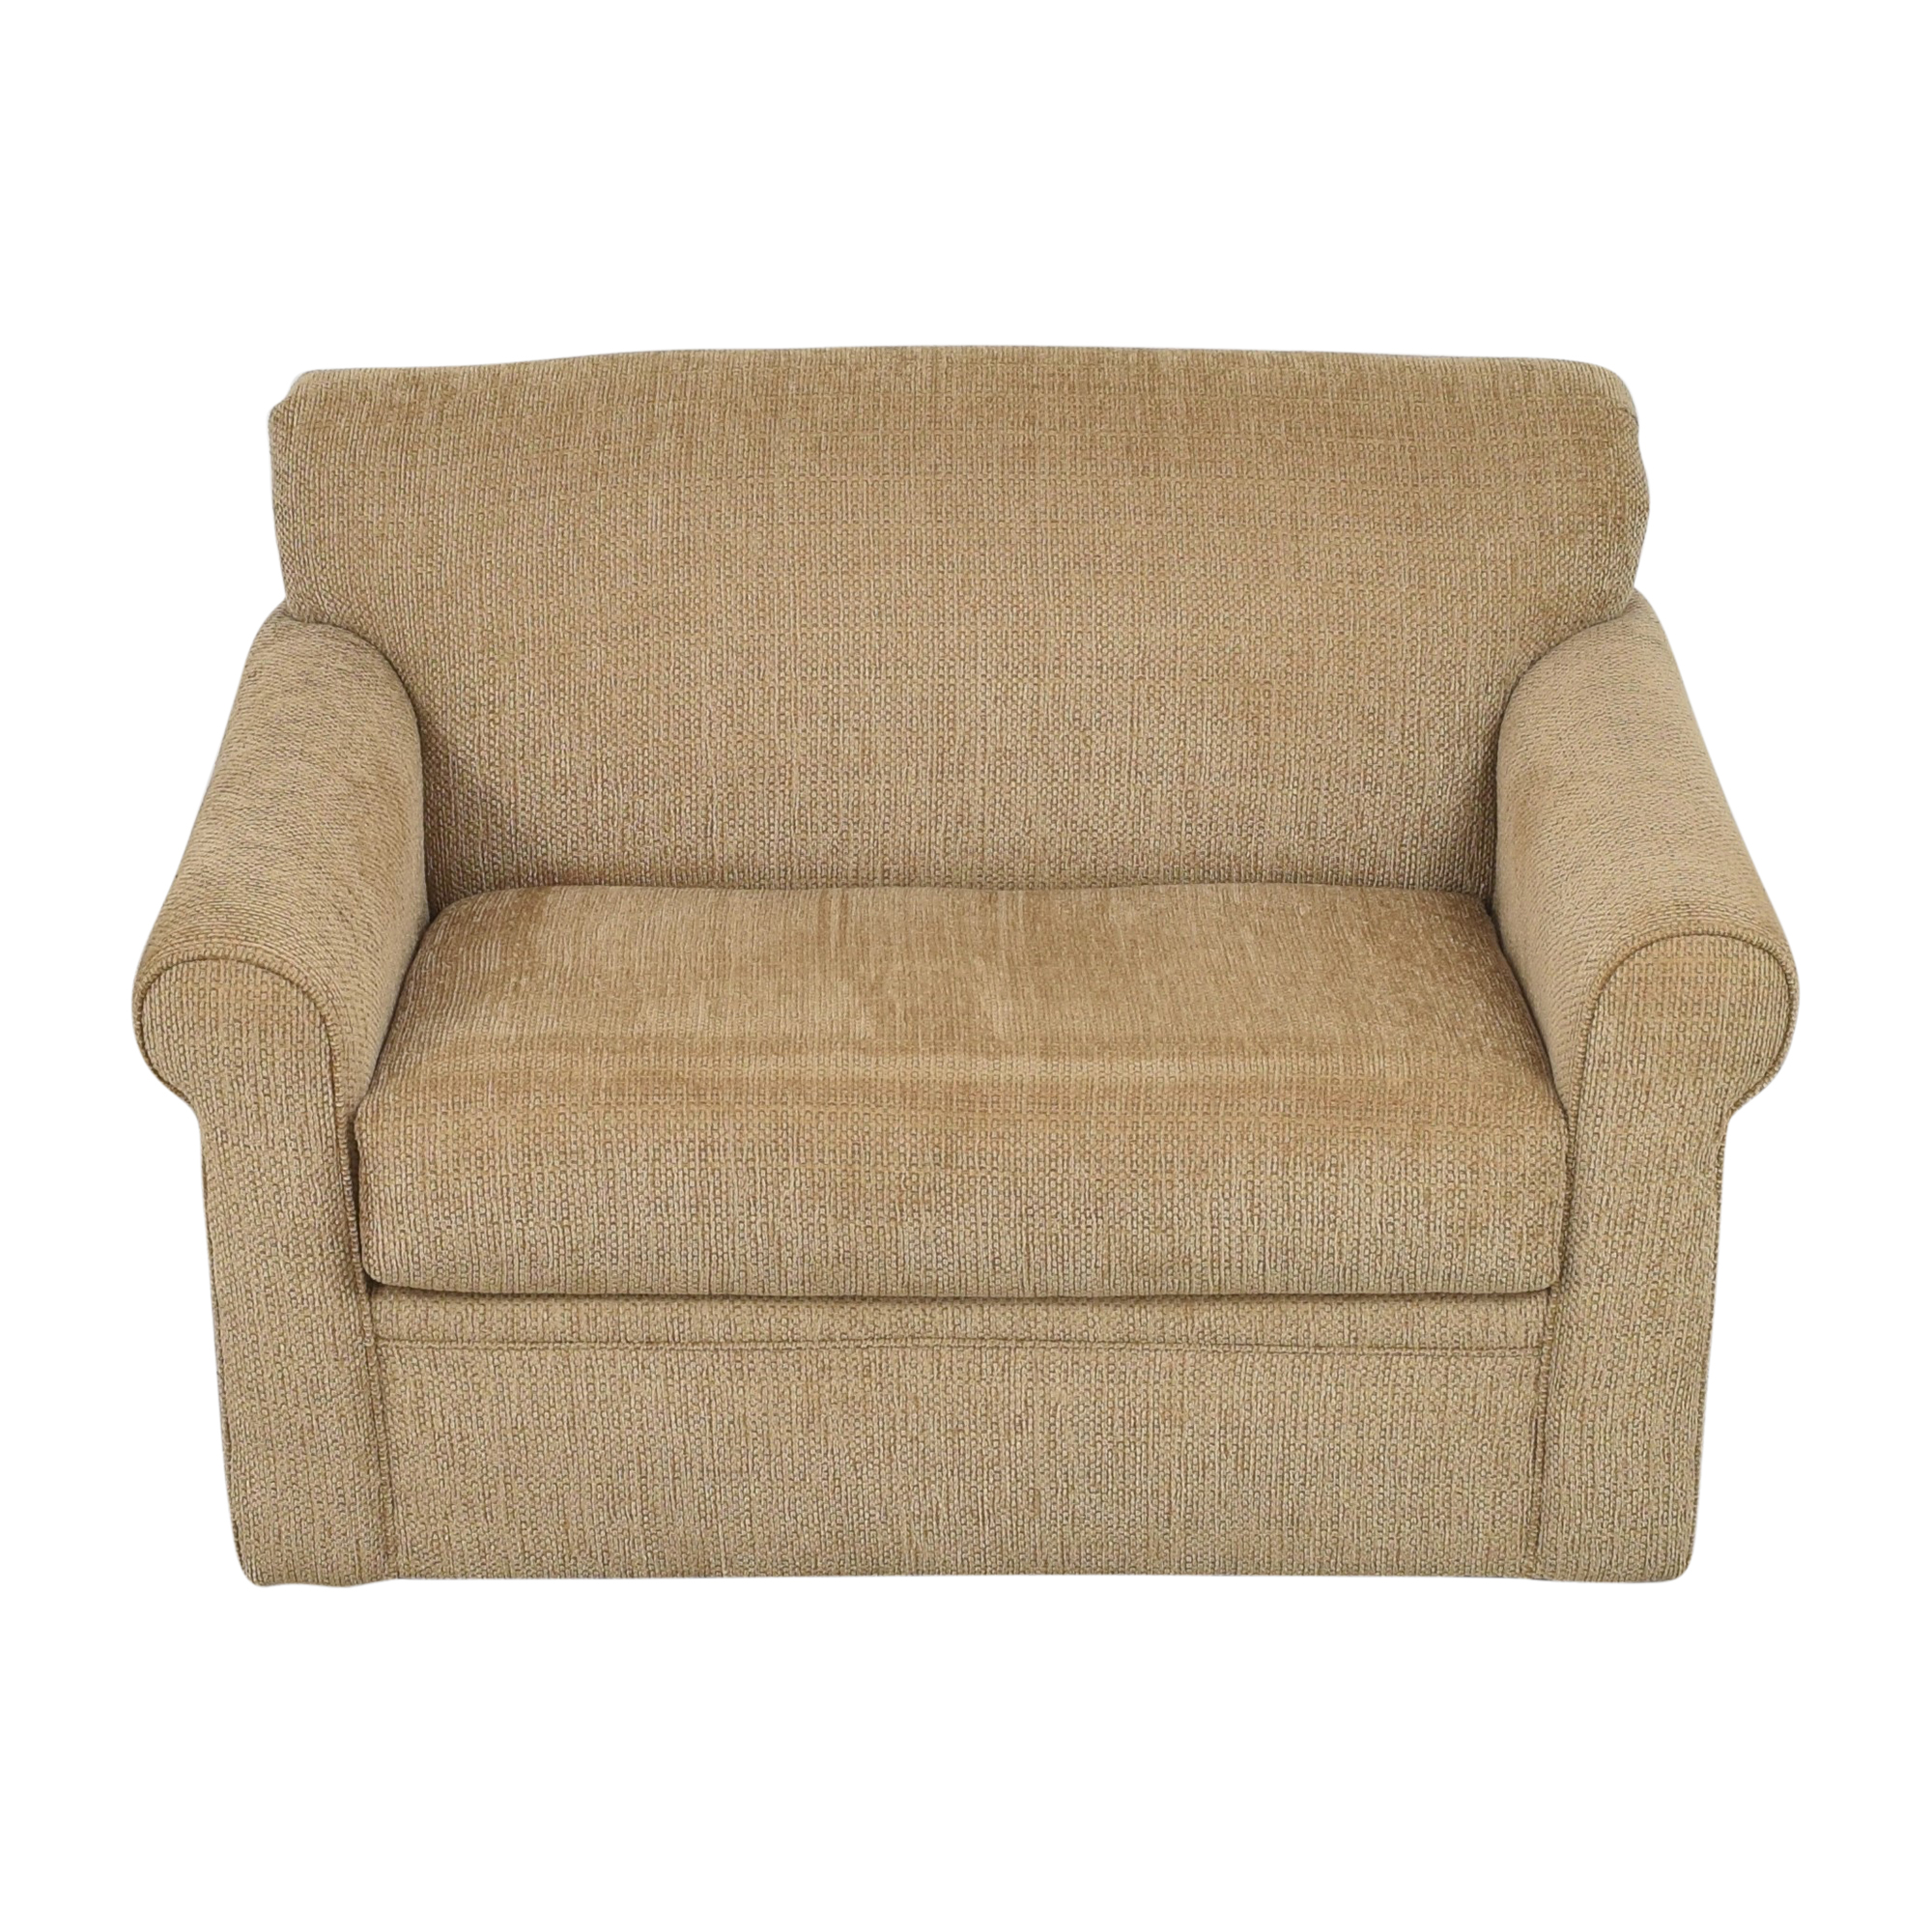 Overnight Sofa Sleeper Chair / Sofa Beds